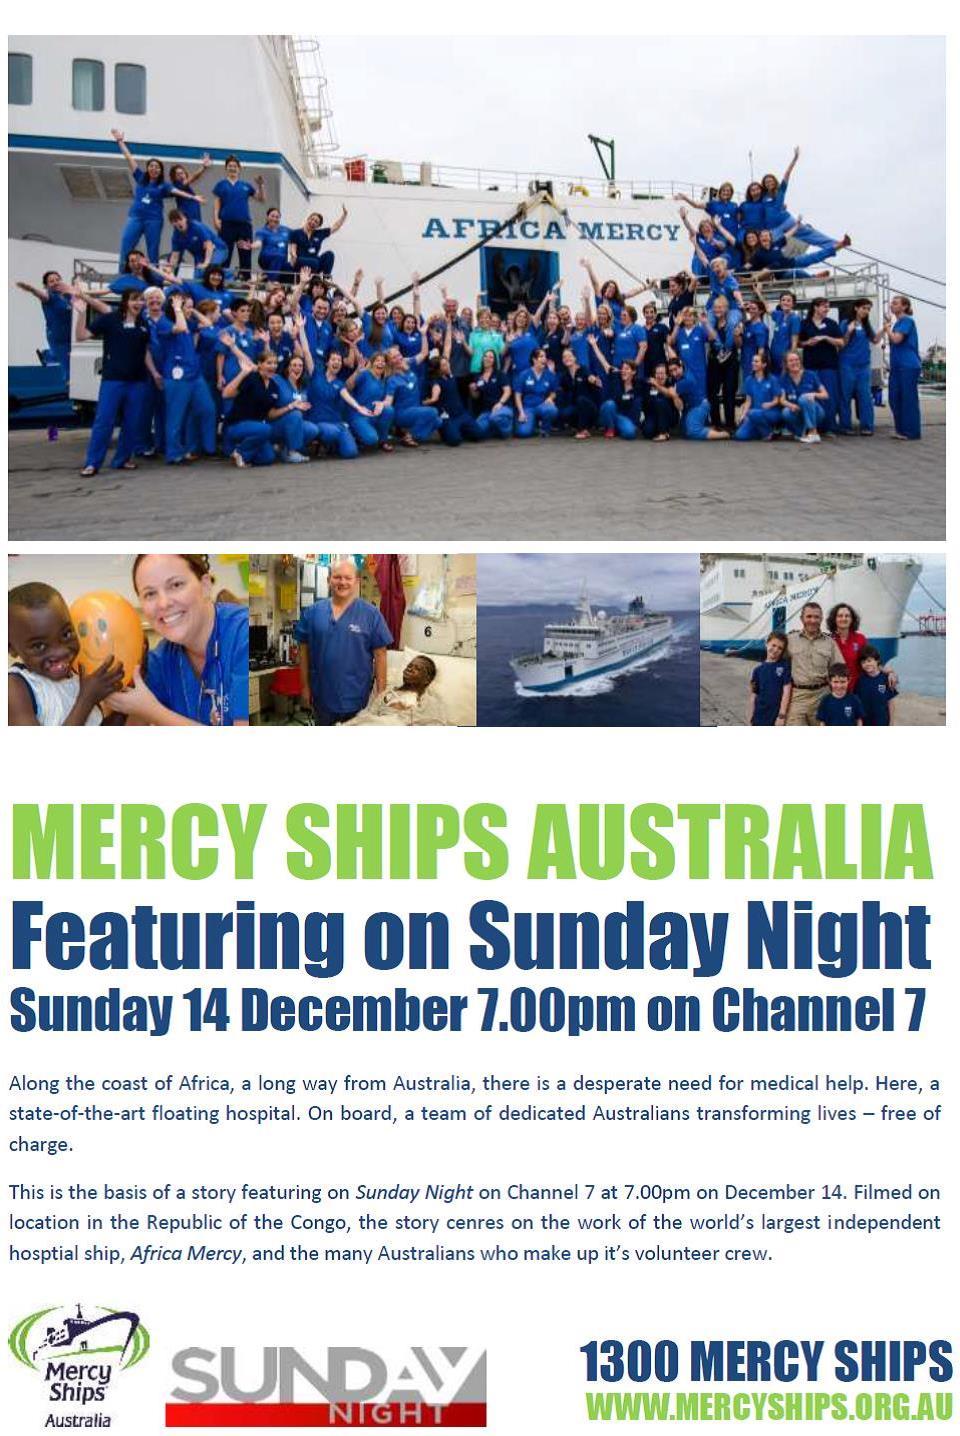 Mercy ships,mollymook,beach,ocean swimmers,Africa,Mercy,ships